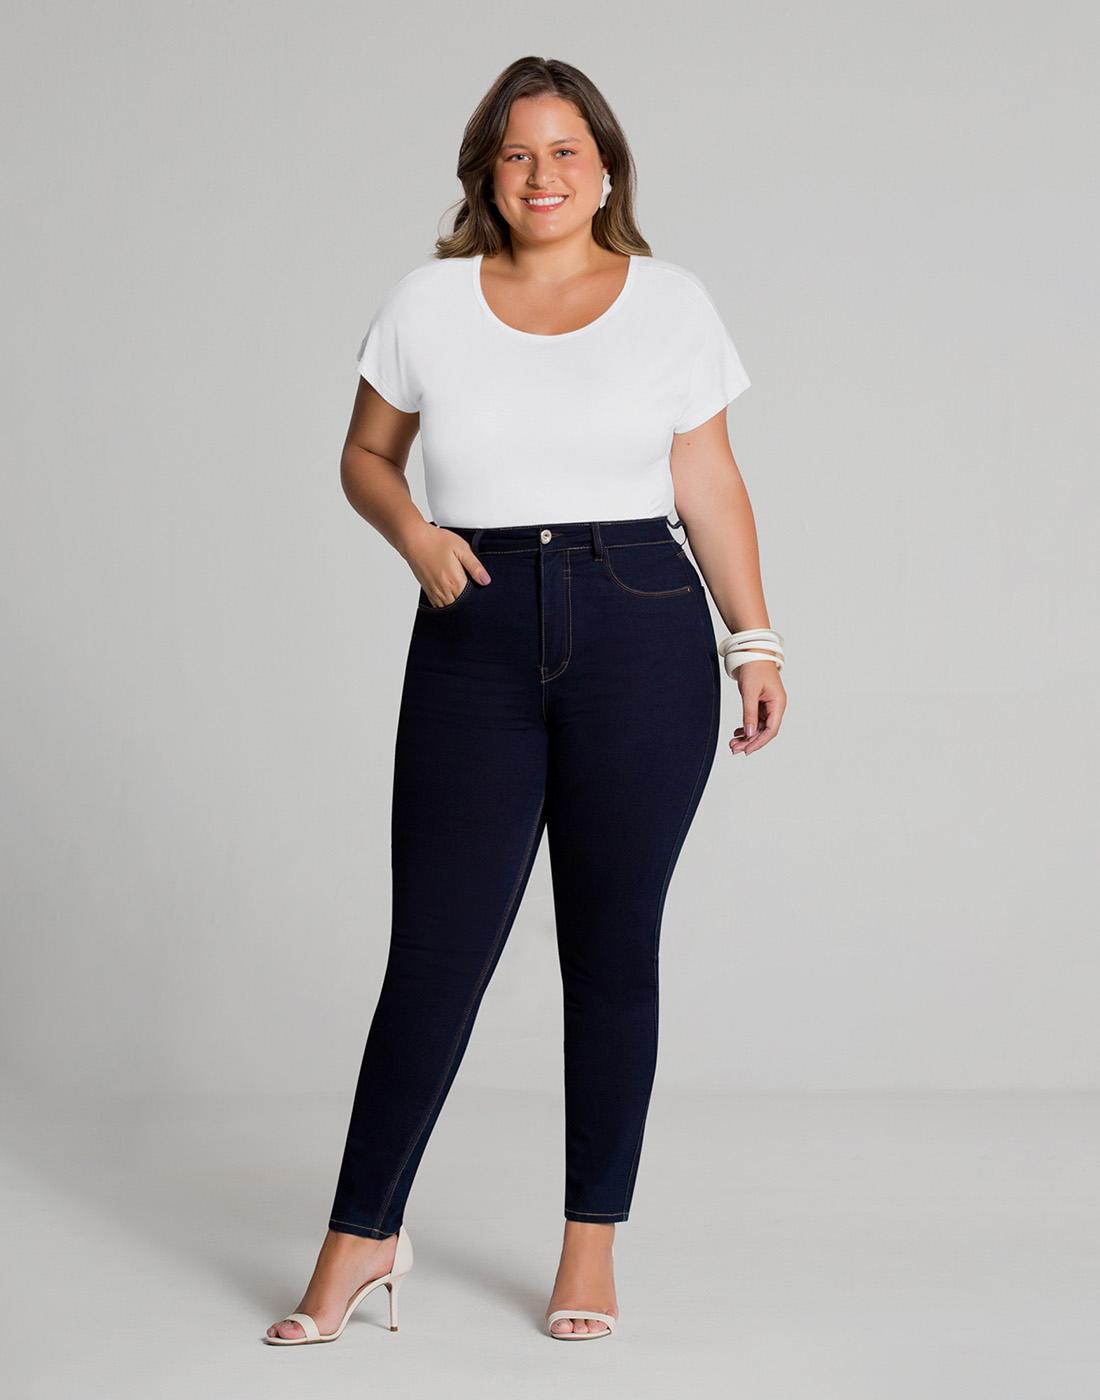 Blusa Básica Mullet Plus Size Malha Viscose Lunender Mais Mulher